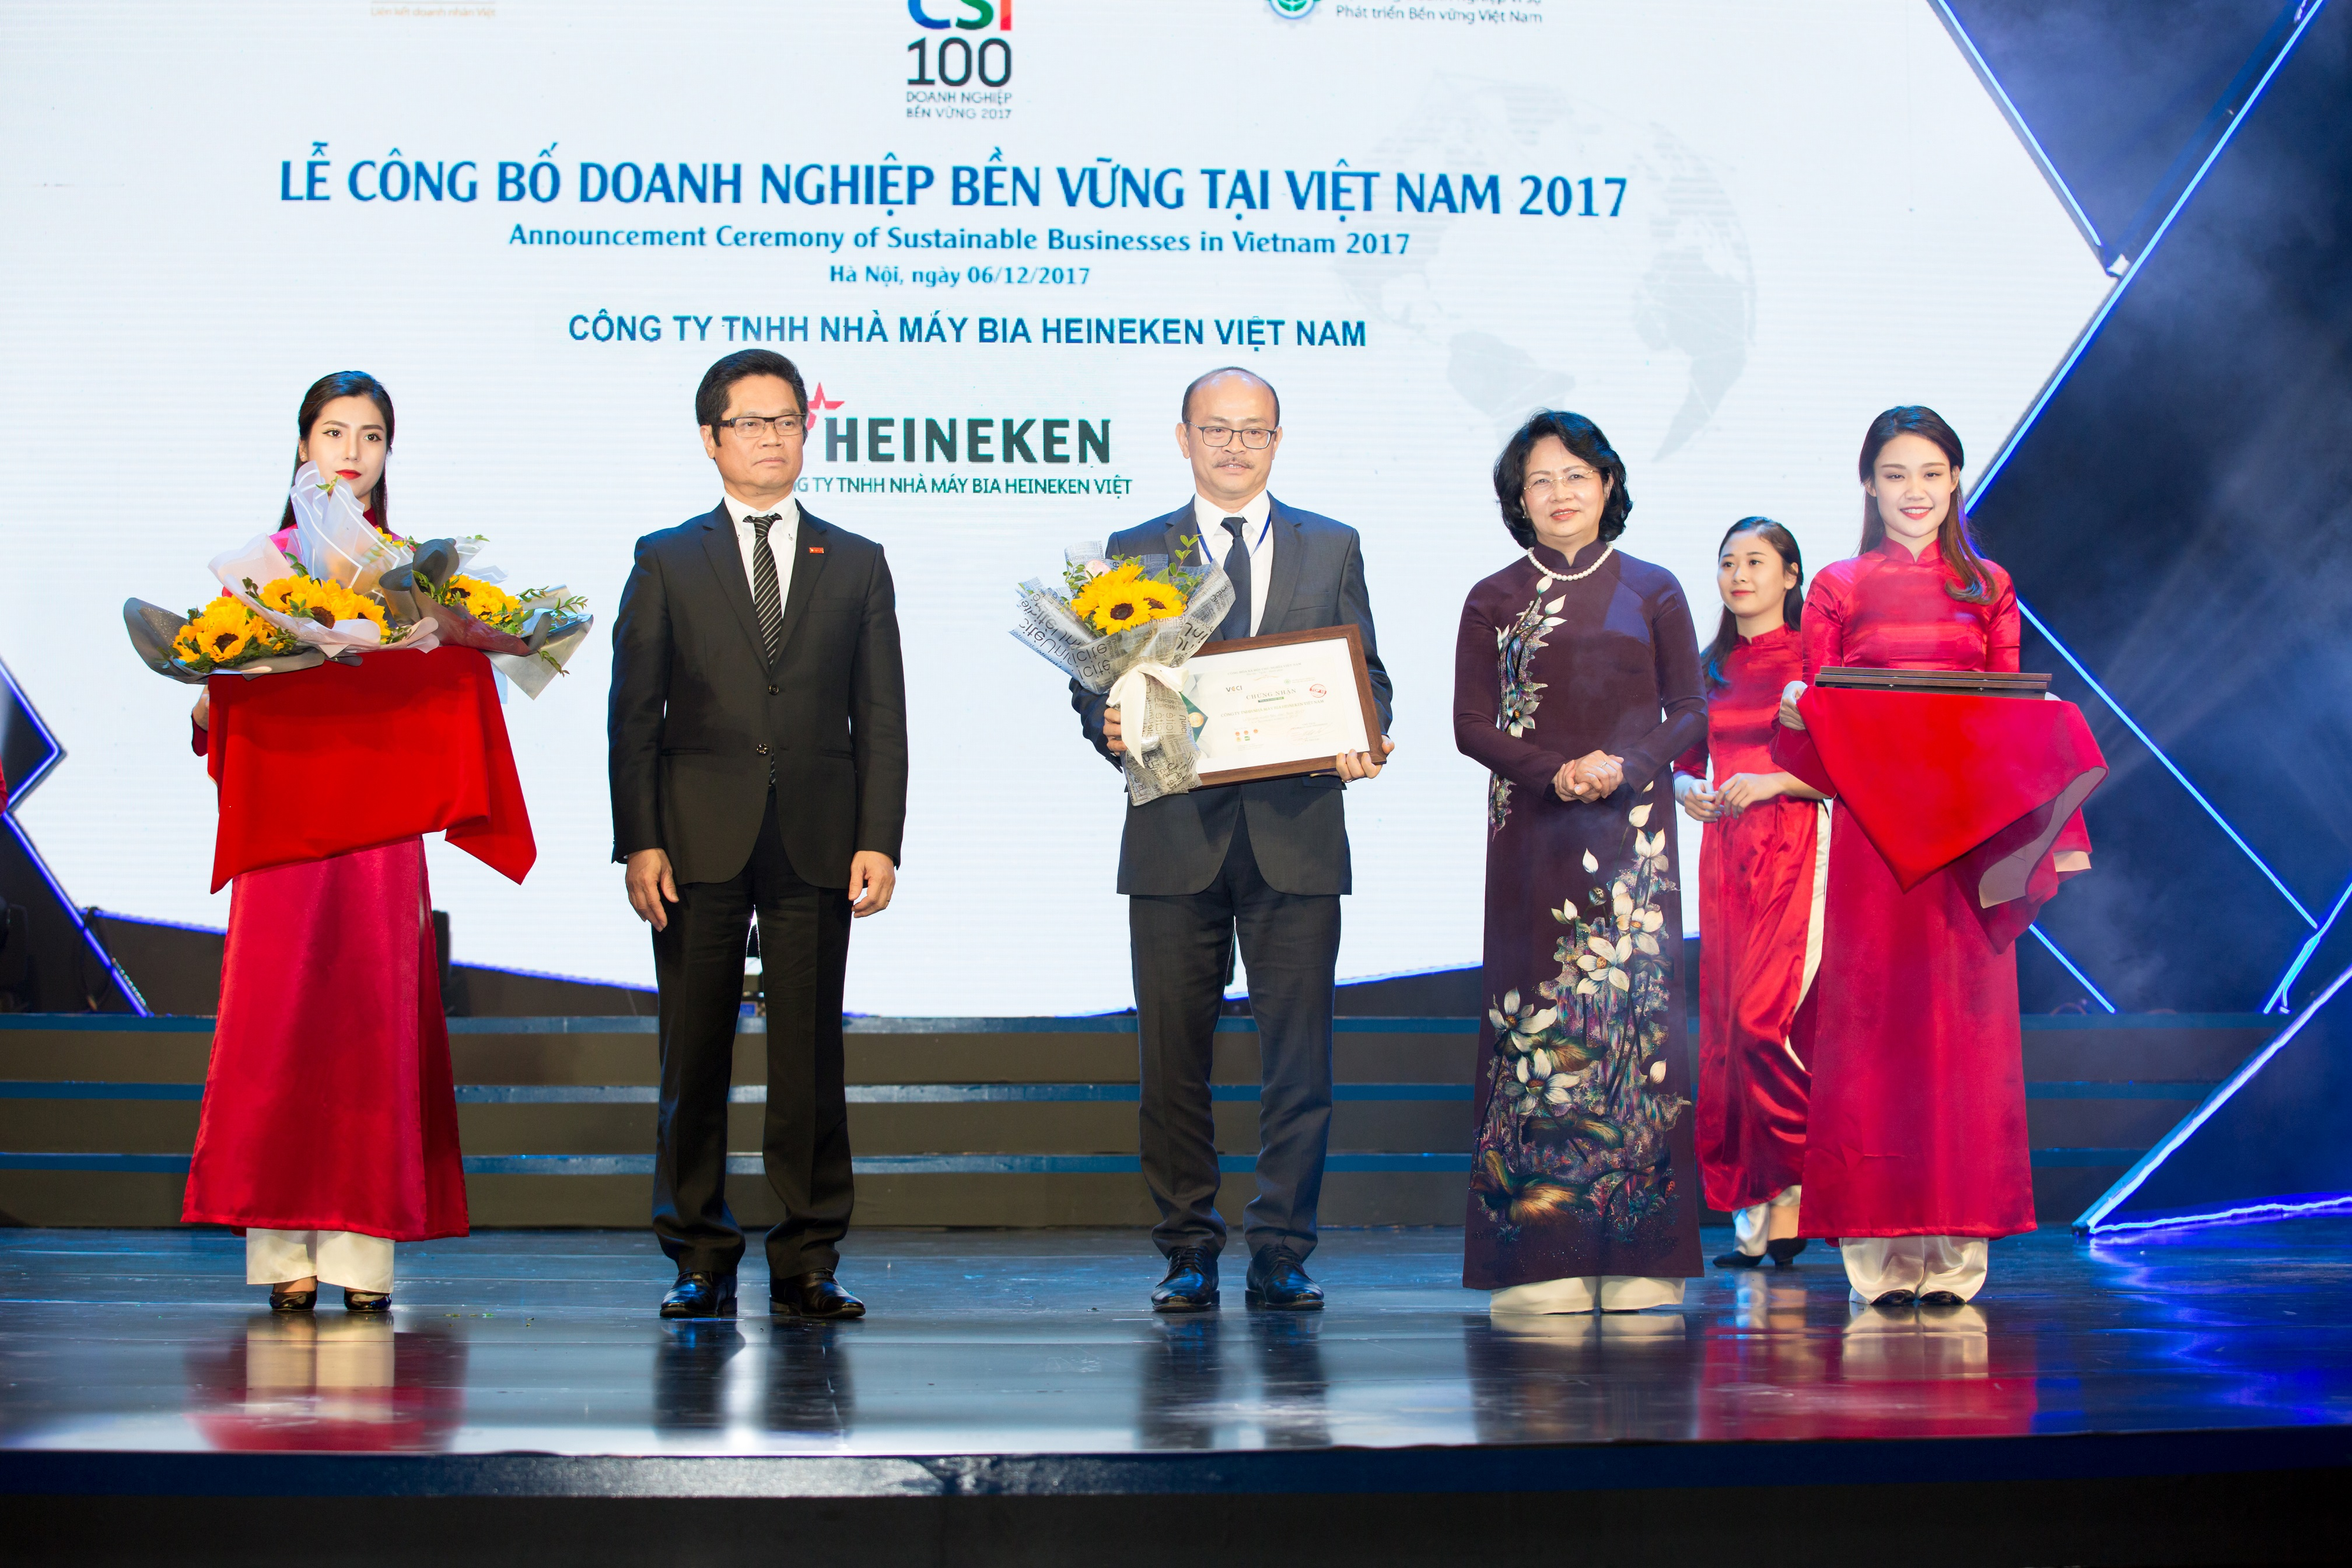 Heineken Vietnam named first sustainable manufacturing company